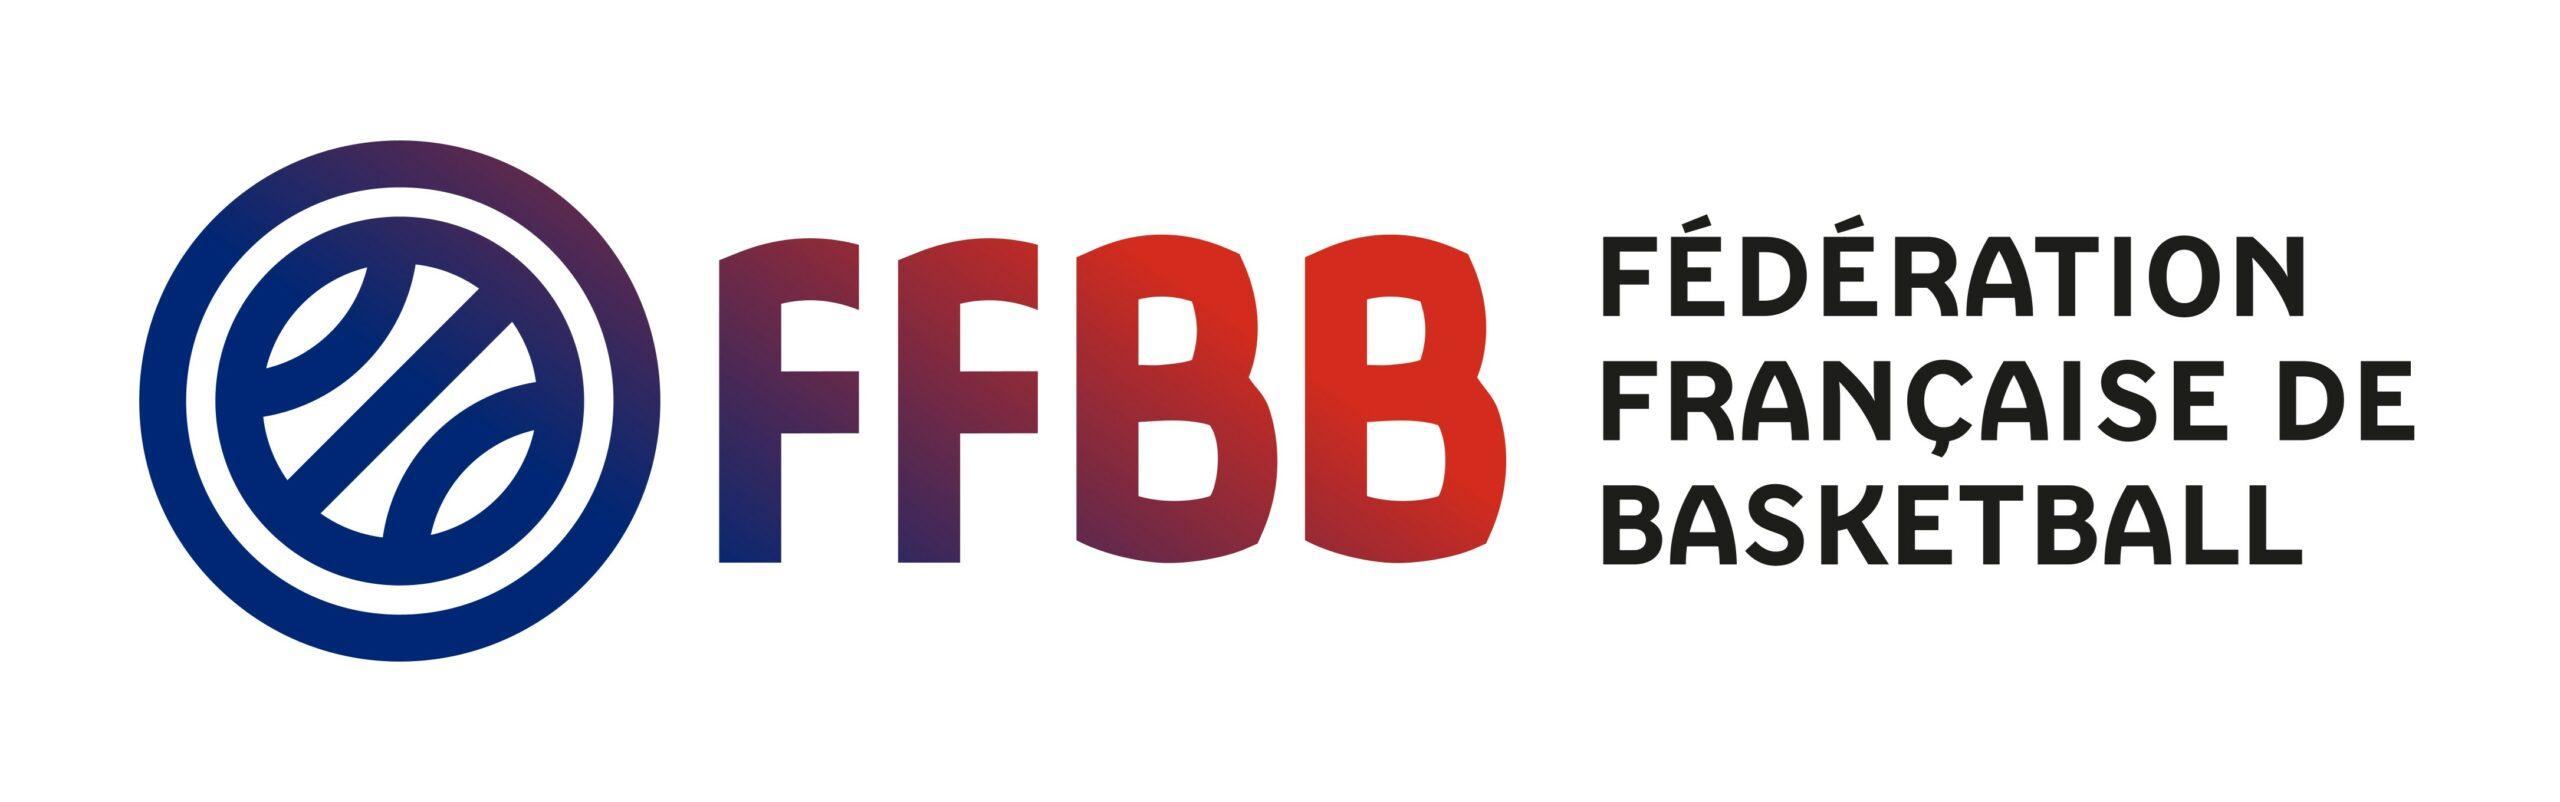 logo ffbb baseline